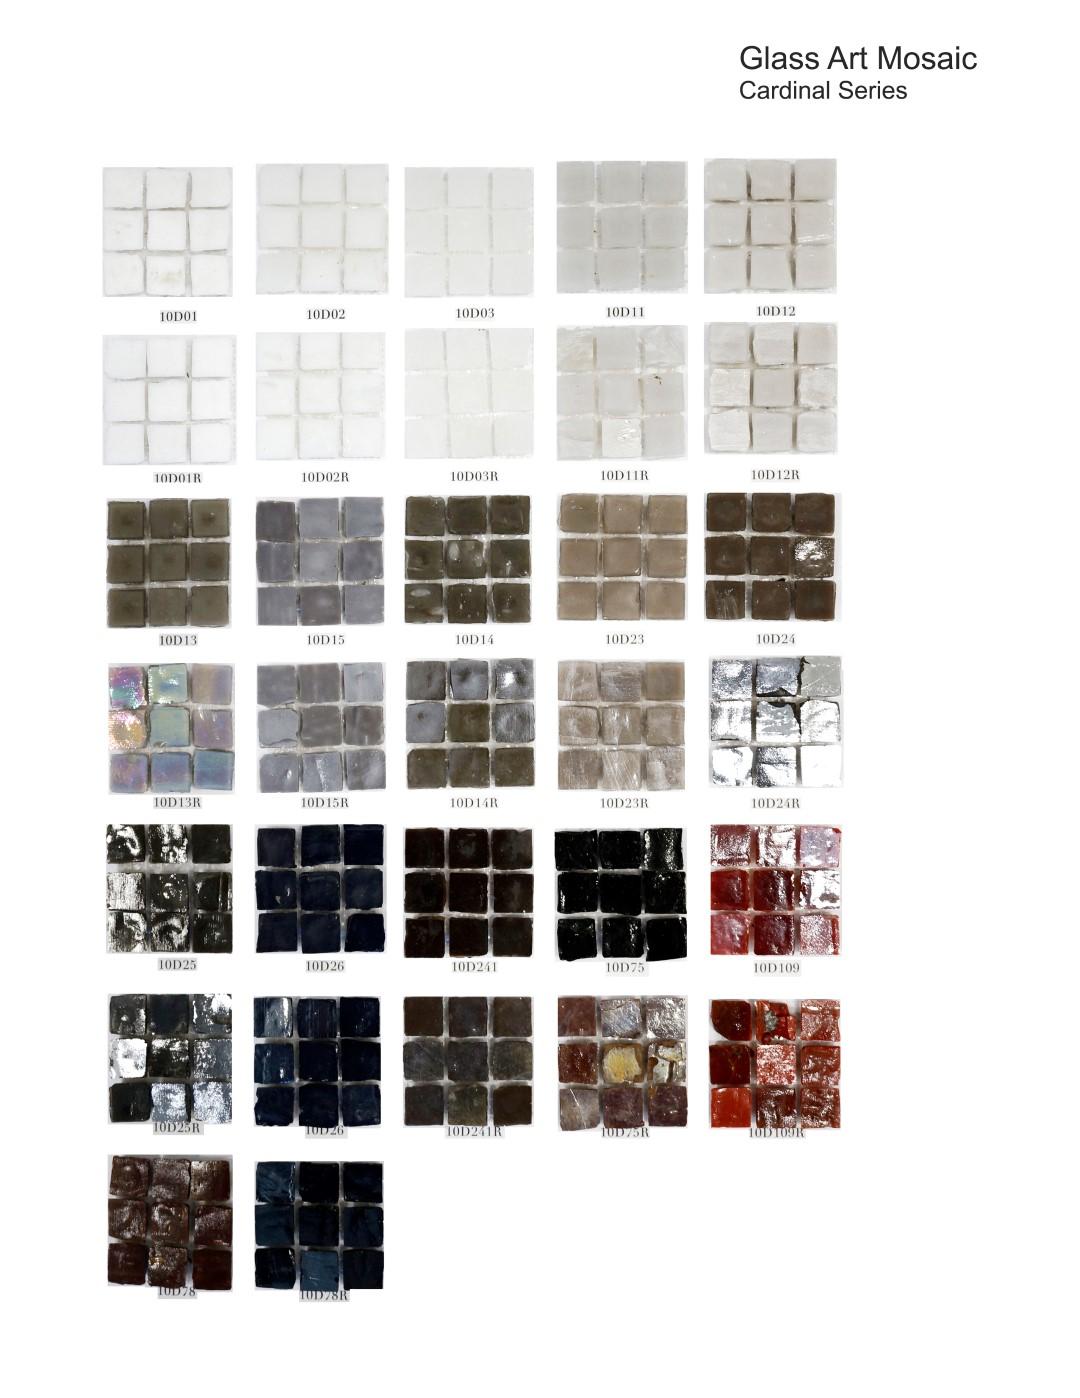 Glass Art Mosaic Cardinal Series (Large).jpg